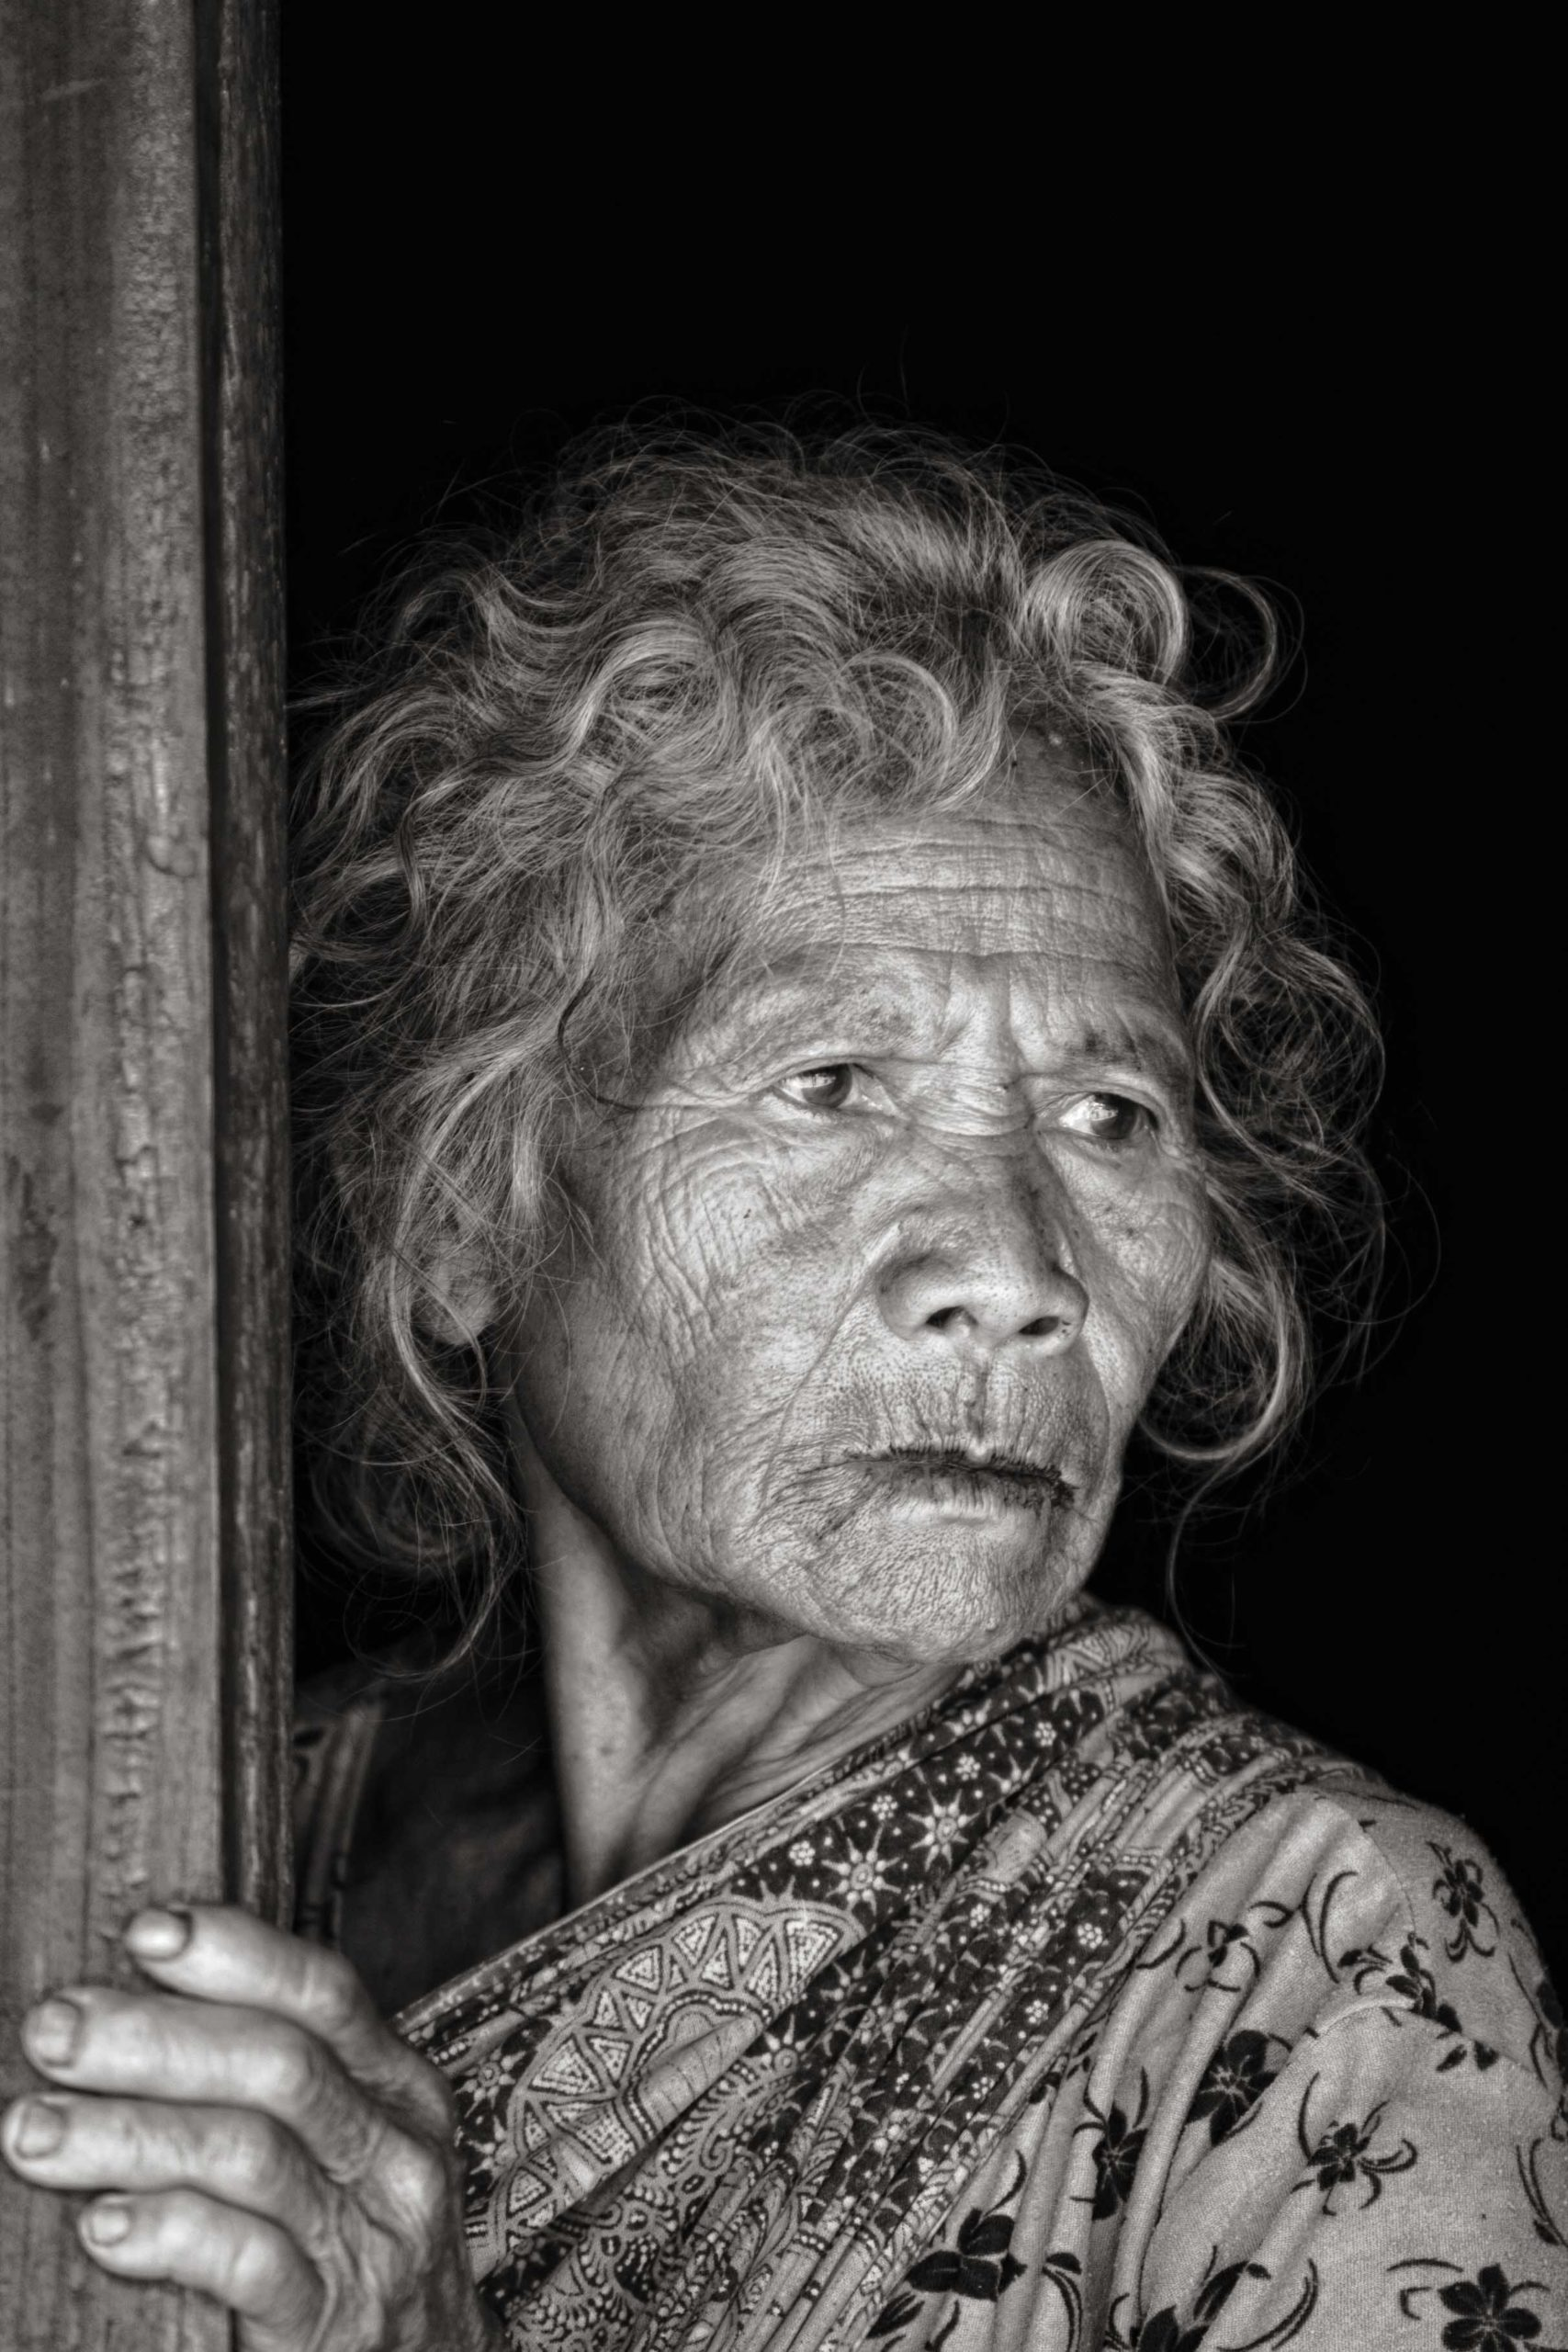 Indonesian Visage 03